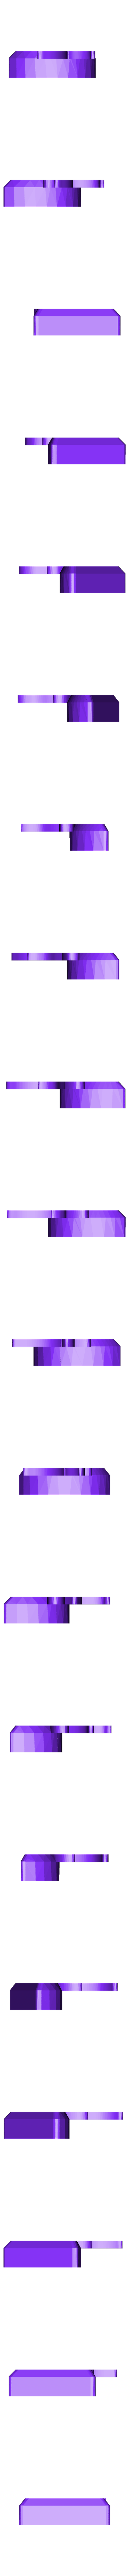 plp-col.stl Download STL file PLP DRESS • 3D printable template, PLP